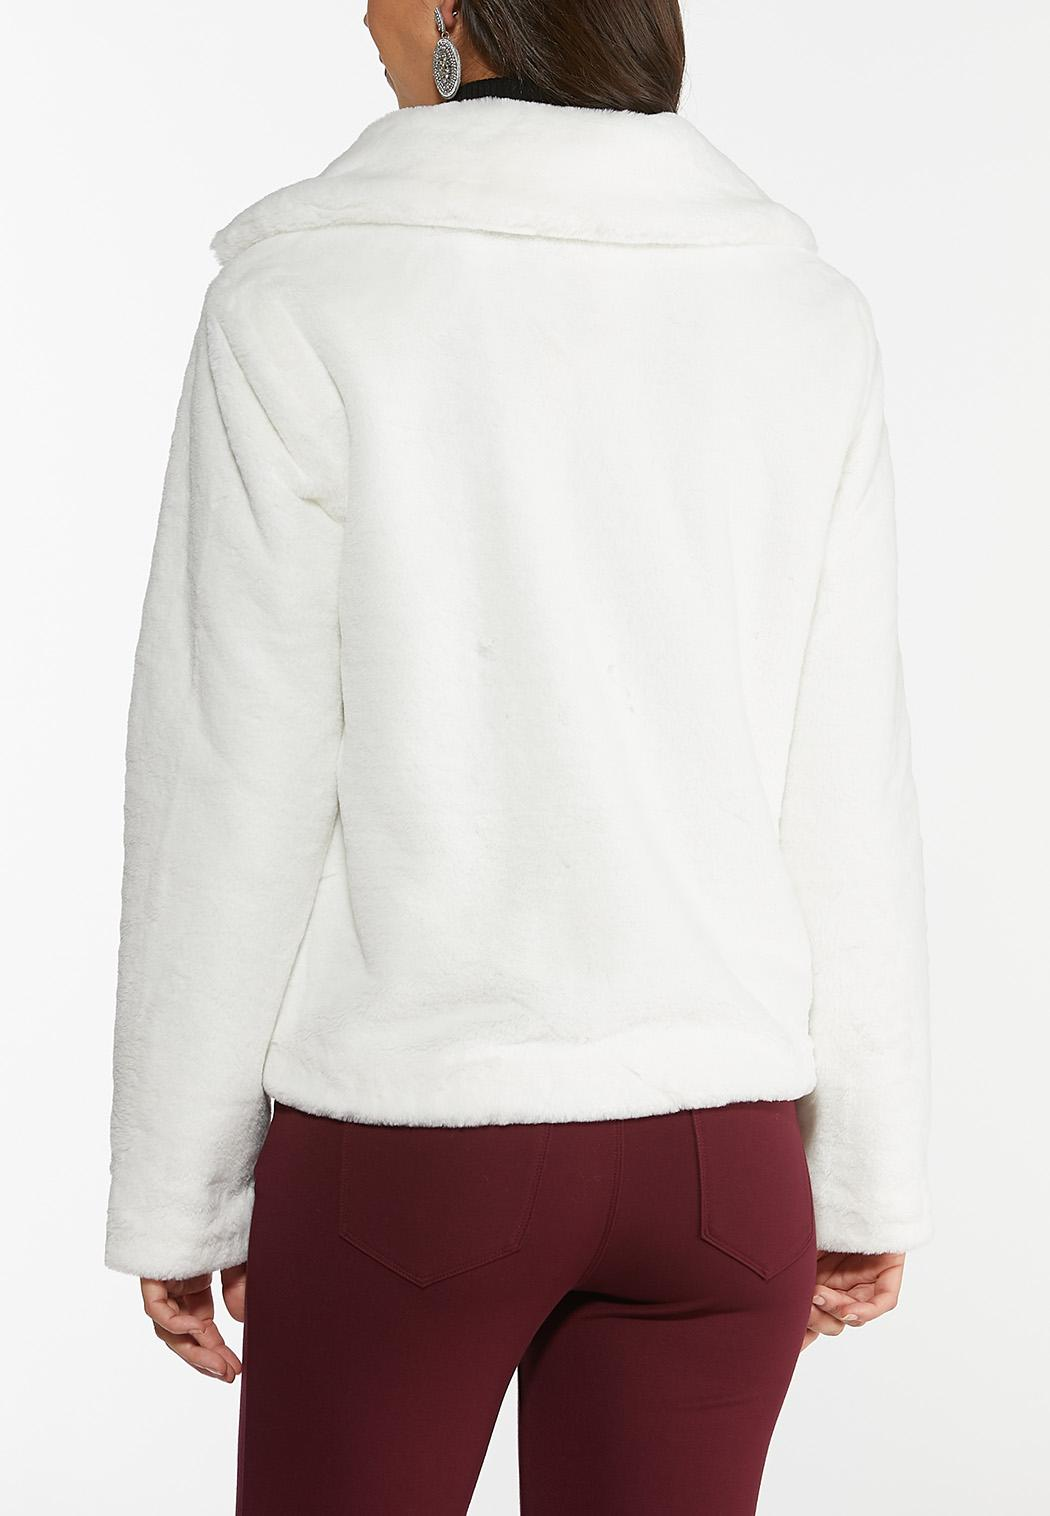 Furry Ivory Coat (Item #44421684)